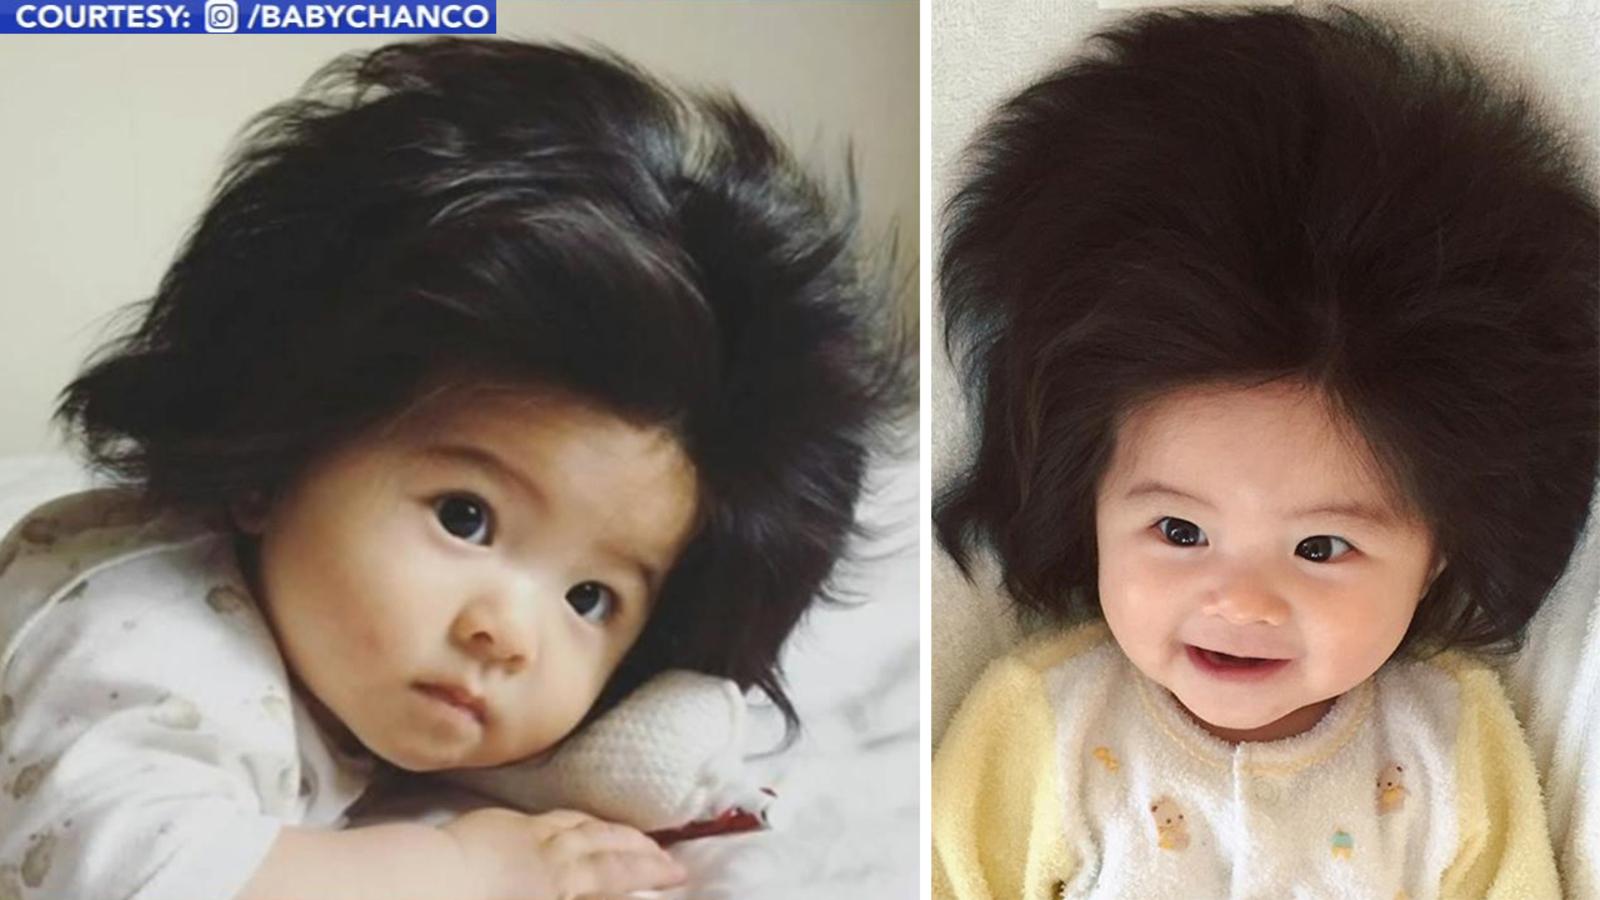 Baby's incredible hair draws Instagram fame - ABC7 San ...